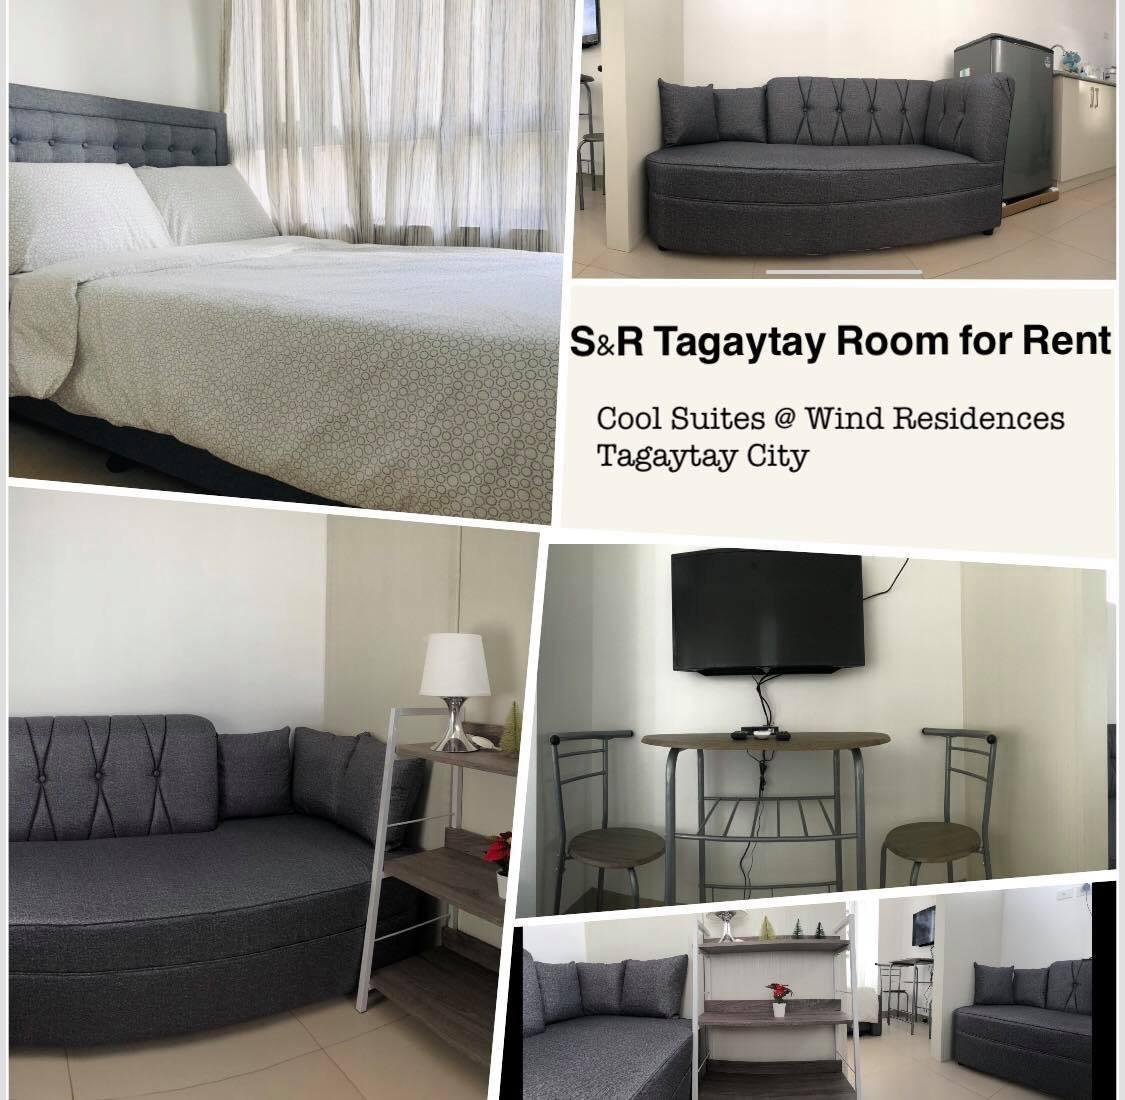 SandR Tagaytay Room For Rent